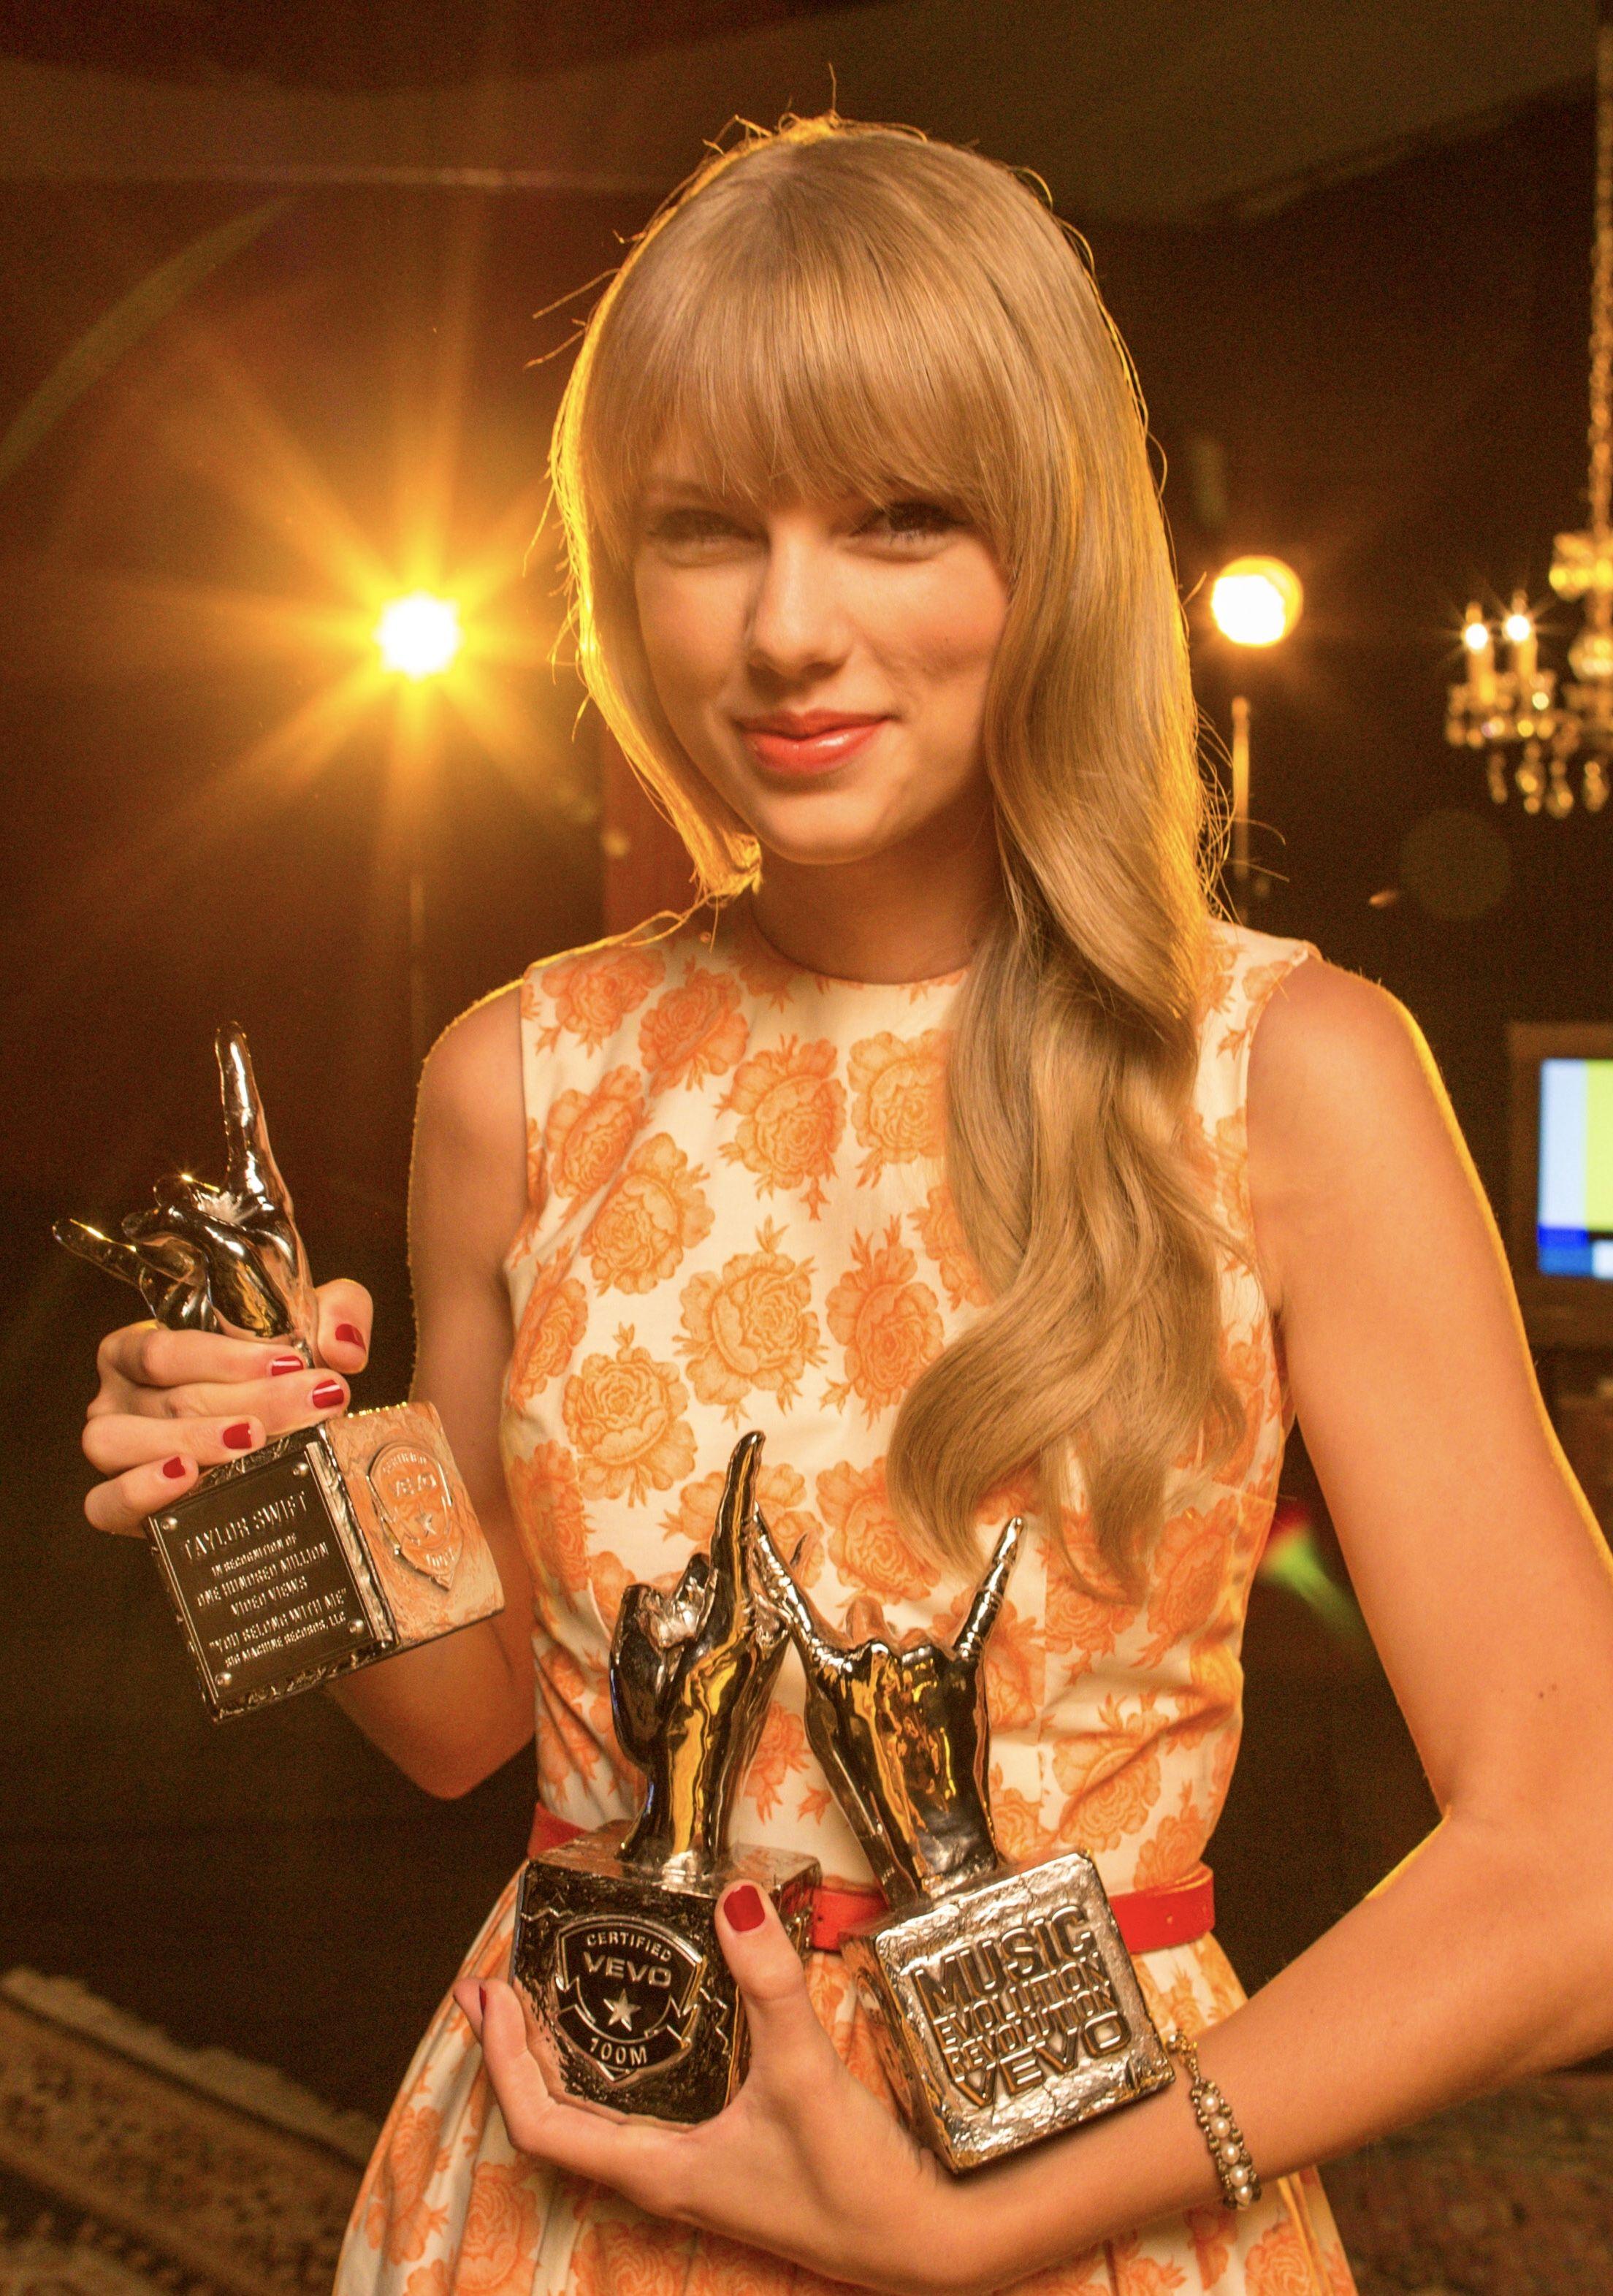 Vevo Certified Award Love Story You Belong With Me Mine The 2012 Vevo Certified Awards Vevo Taylor Swift Awards